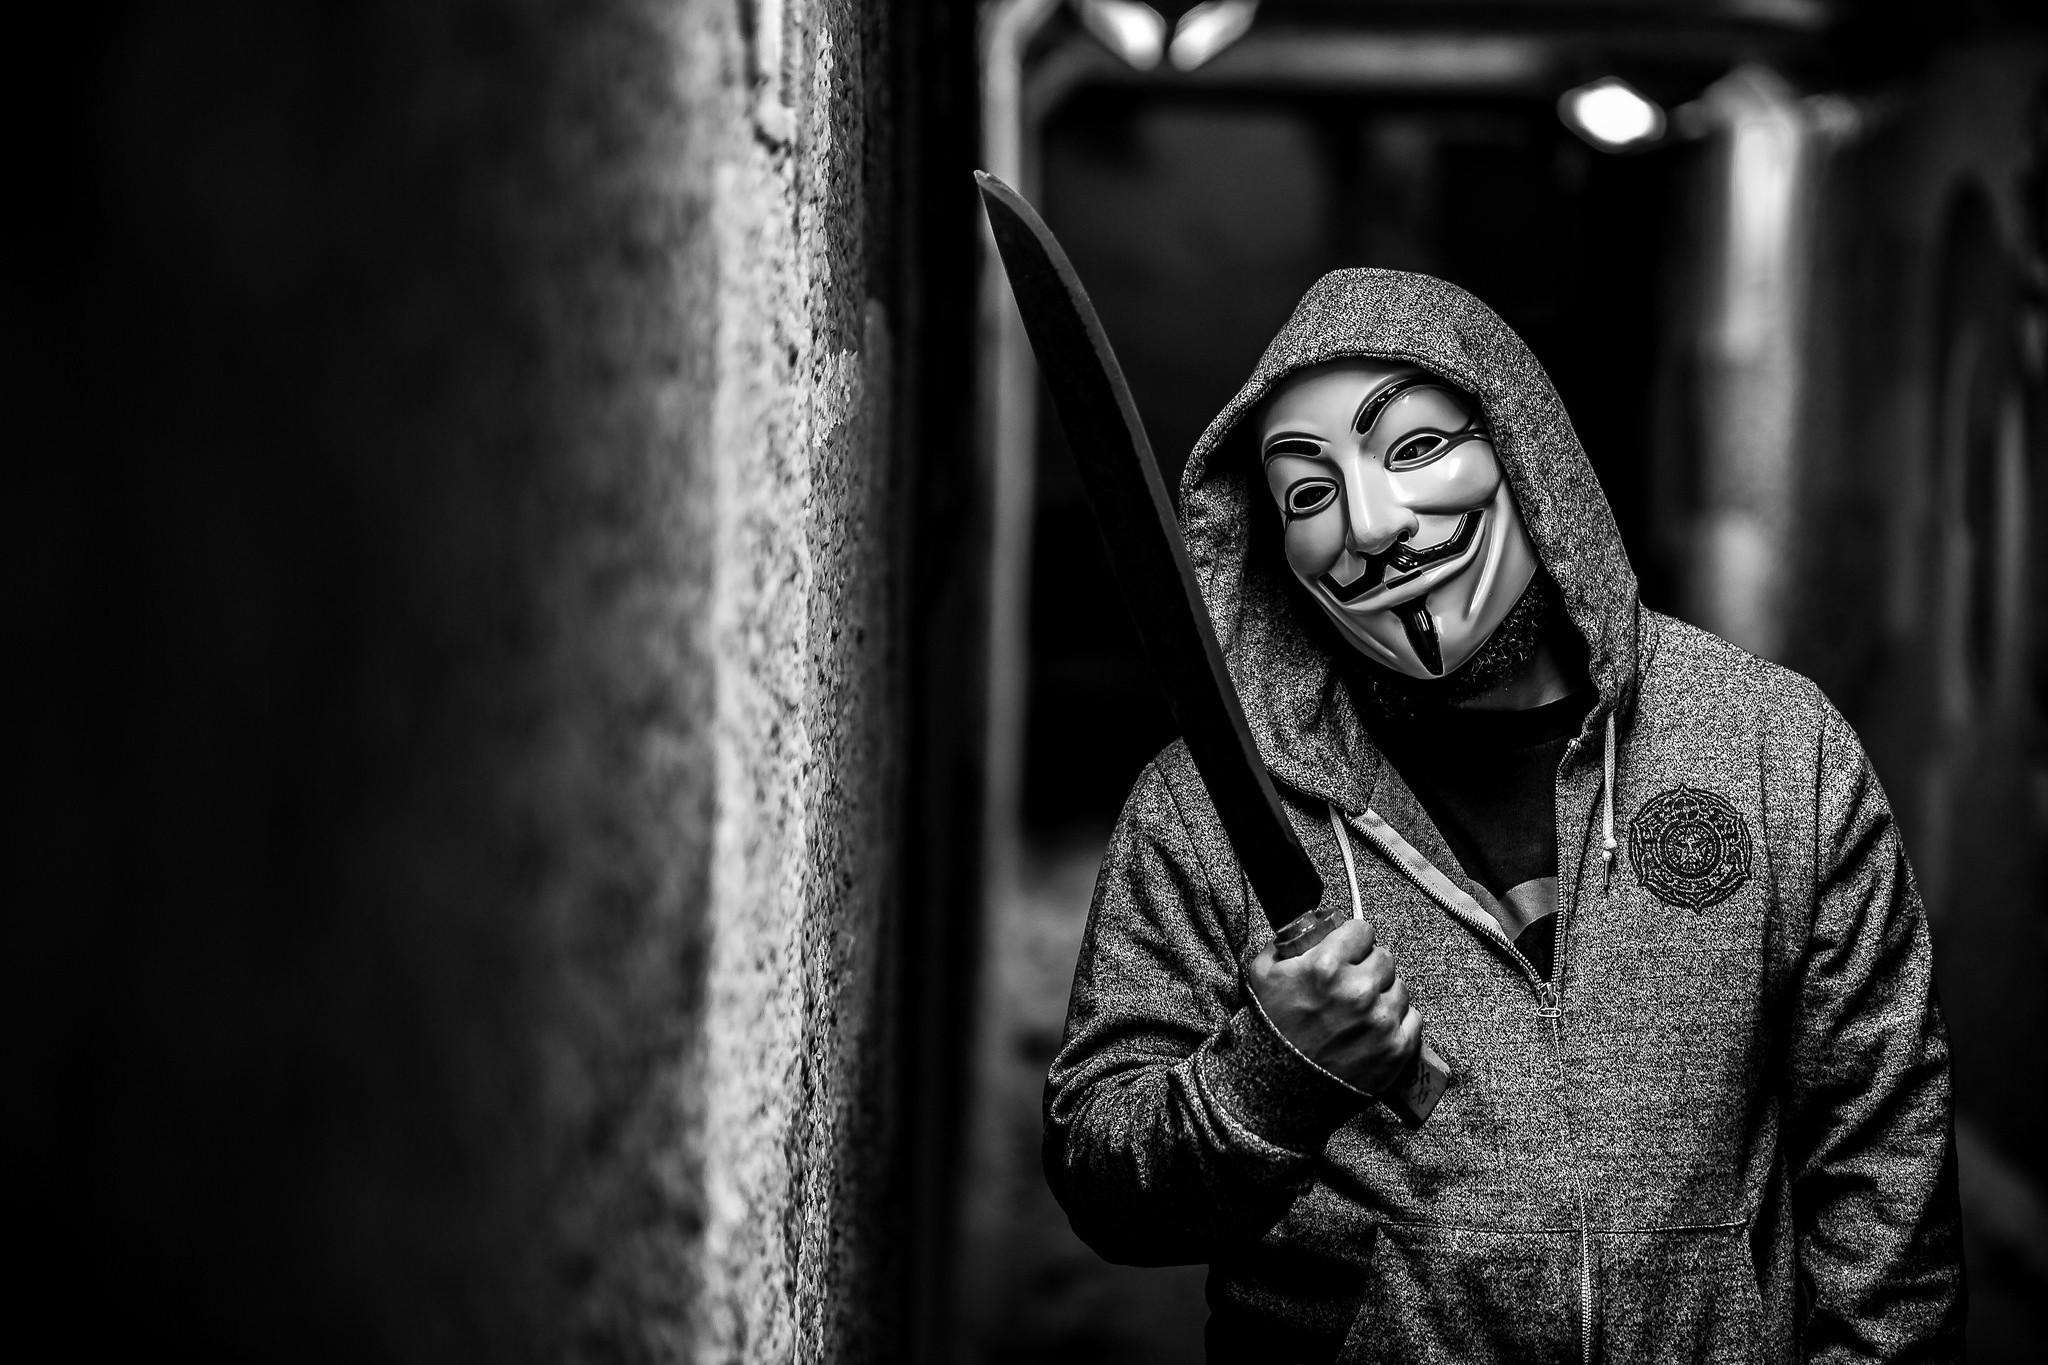 Download wallpaper anonymous, man, mask, machete, men resolution 2048×1365